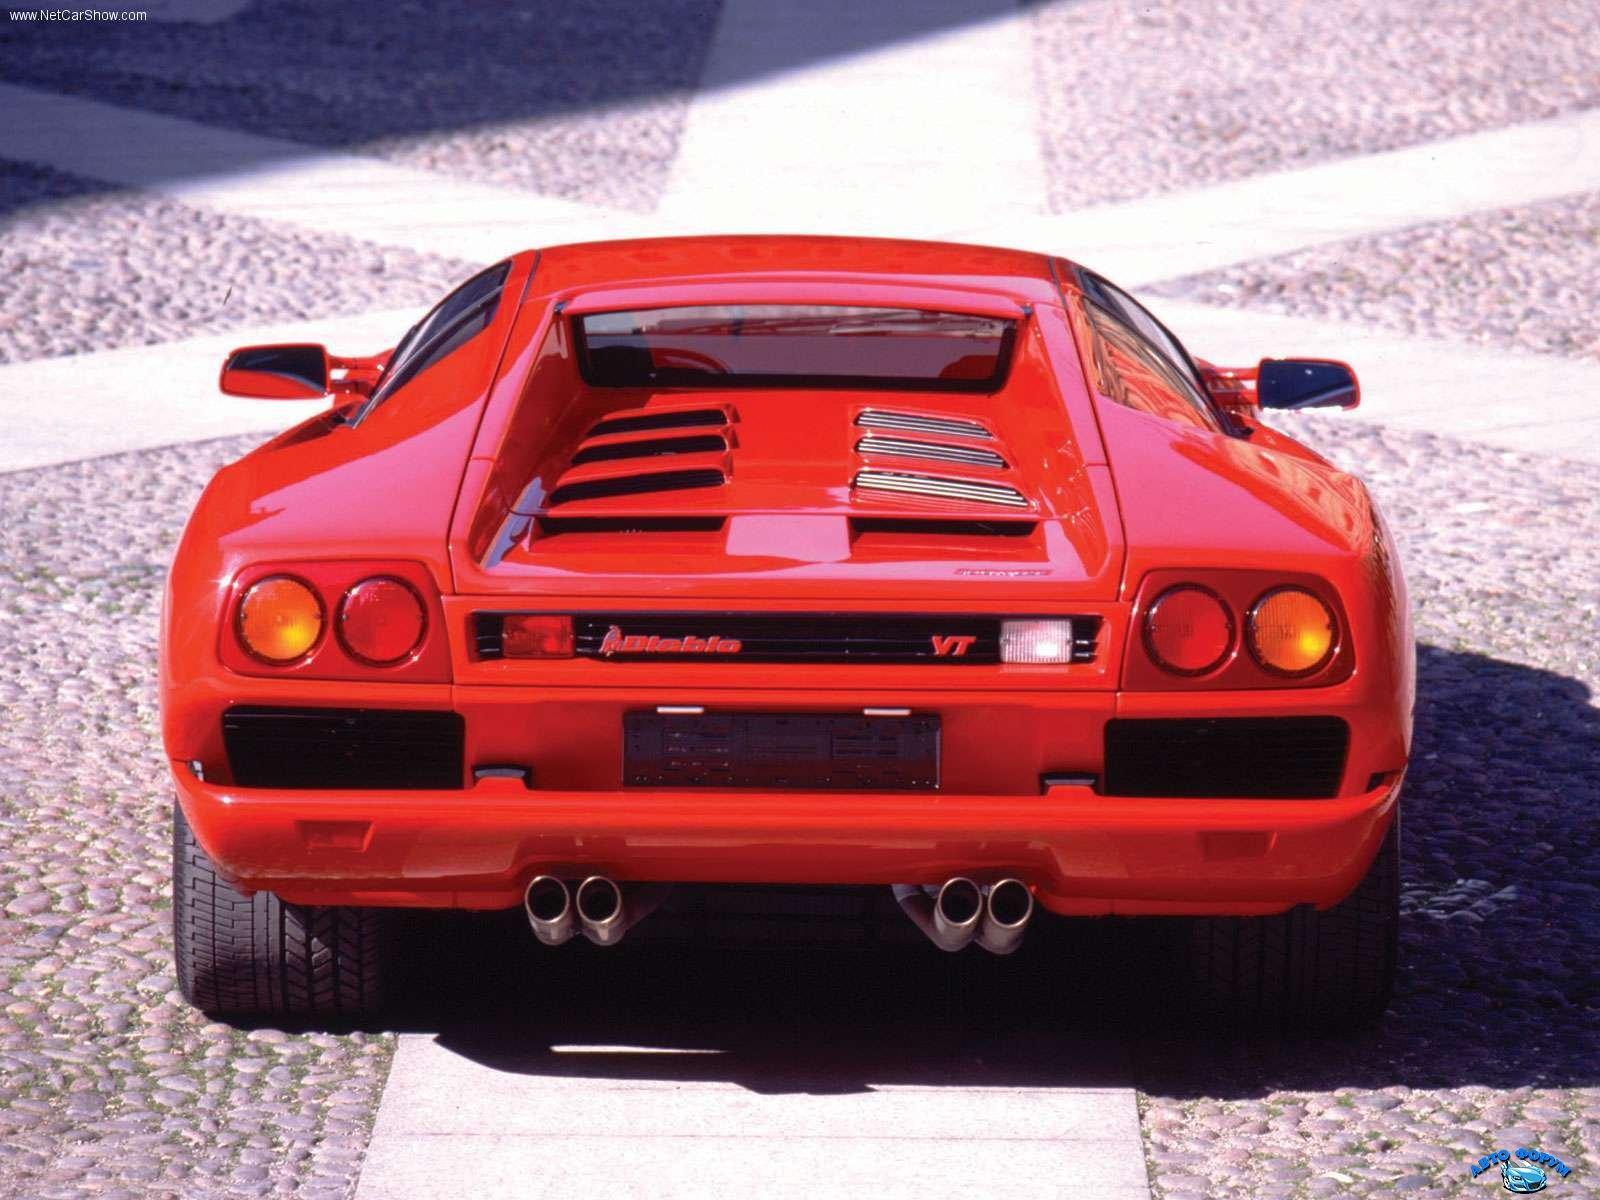 Lamborghini-Diablo_VT_1993_1600x1200_wallpaper_06.jpg